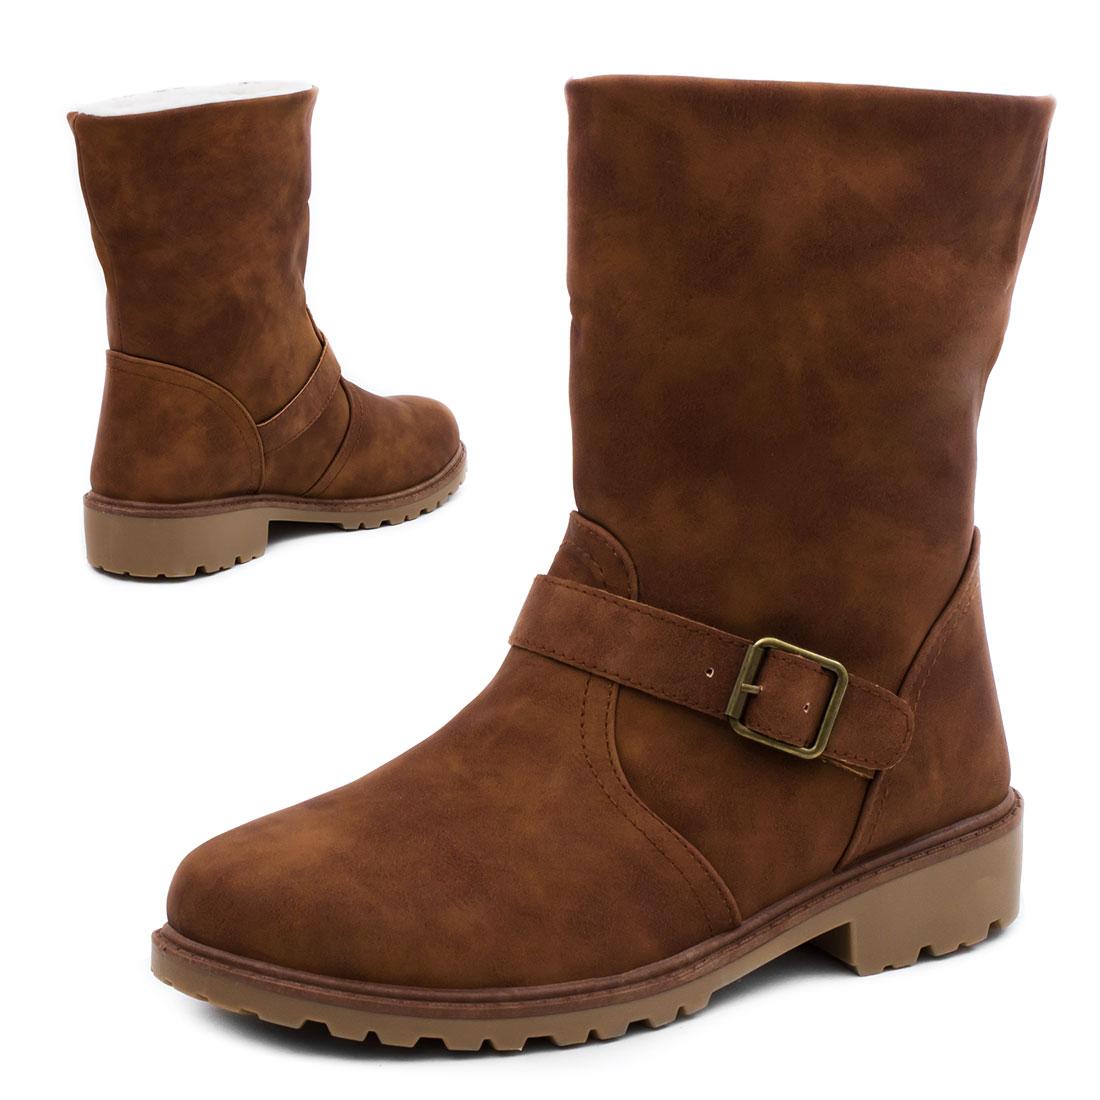 damen boots stiefeletten stiefel warm gef ttert schuhe gr e 36 37 38 39 40 41 ebay. Black Bedroom Furniture Sets. Home Design Ideas